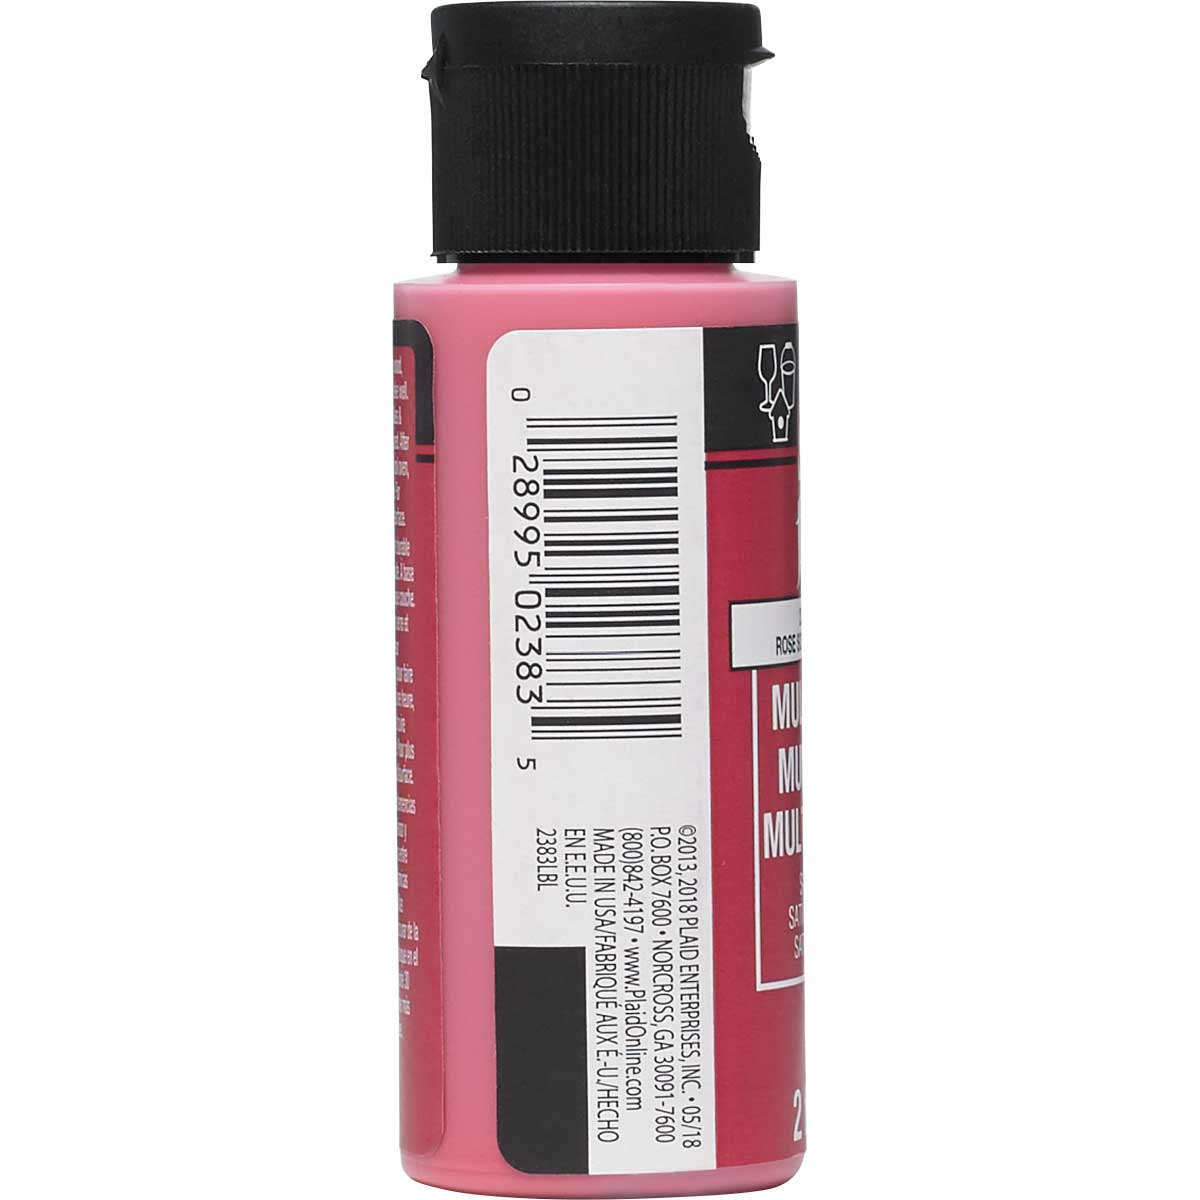 FolkArt ® Multi-Surface Satin Acrylic Paints - Keepsake Rose, 2 oz.